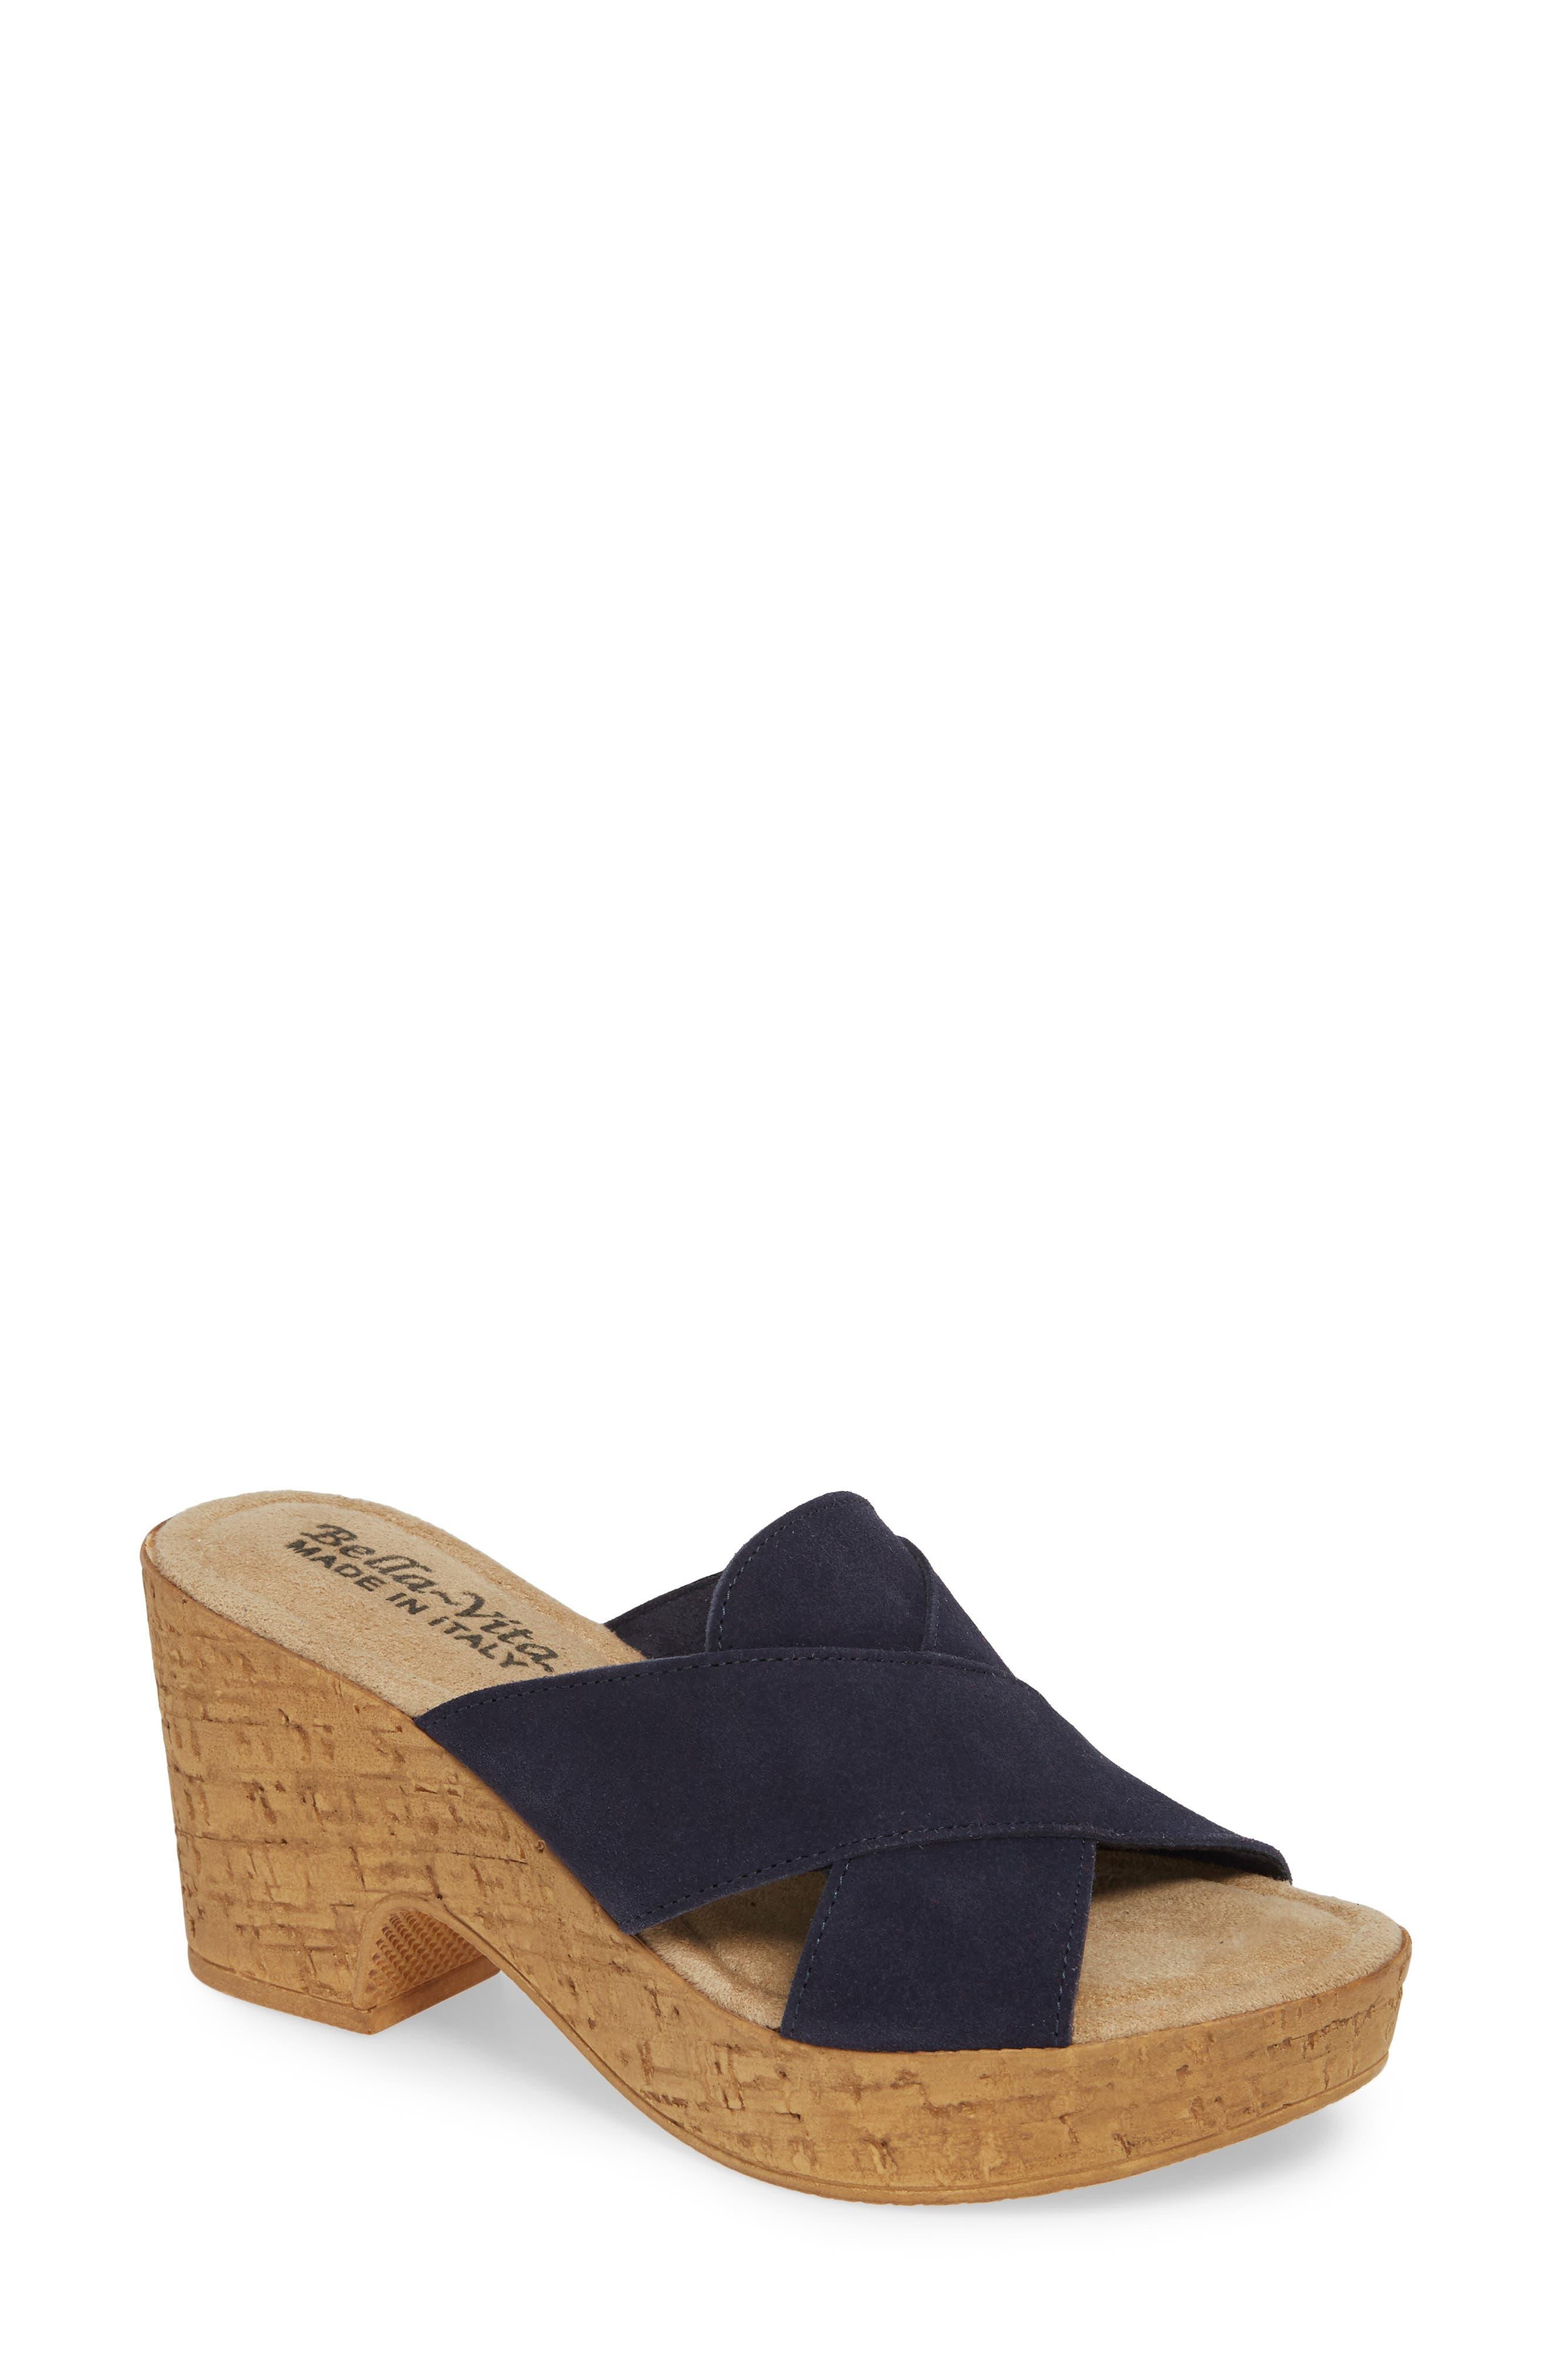 Bella Vita Platform Sandal, Blue